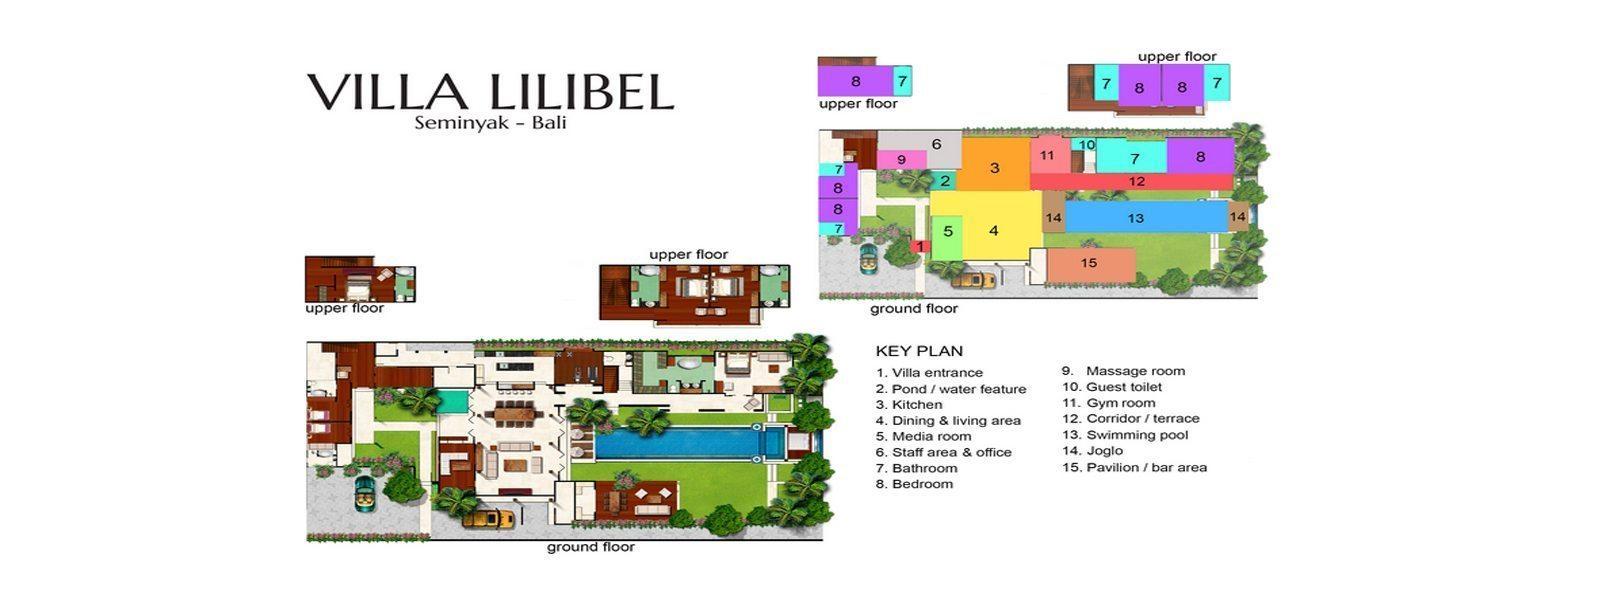 Villa Lilibel Floorplan   Seminyak, Bali